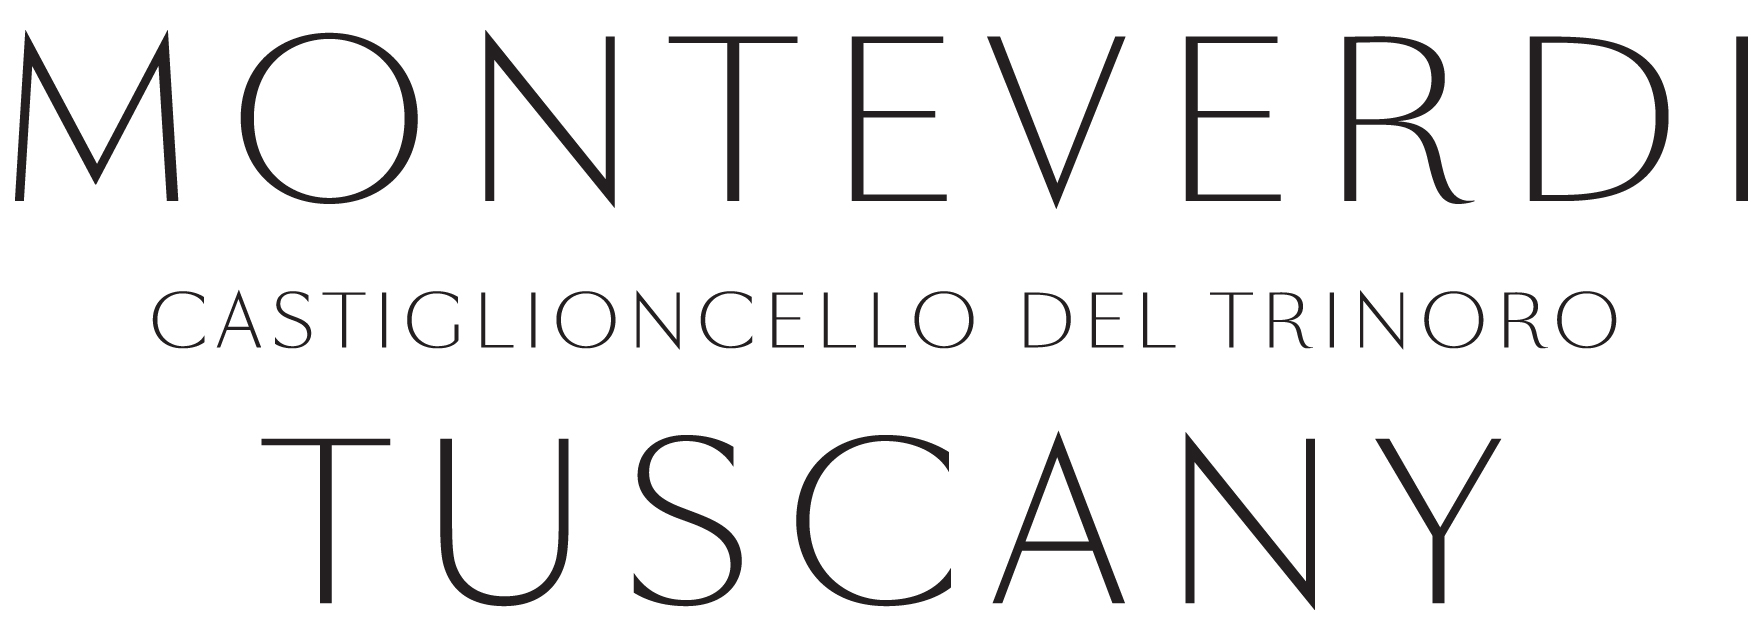 Monteverdi Tuscany Italian